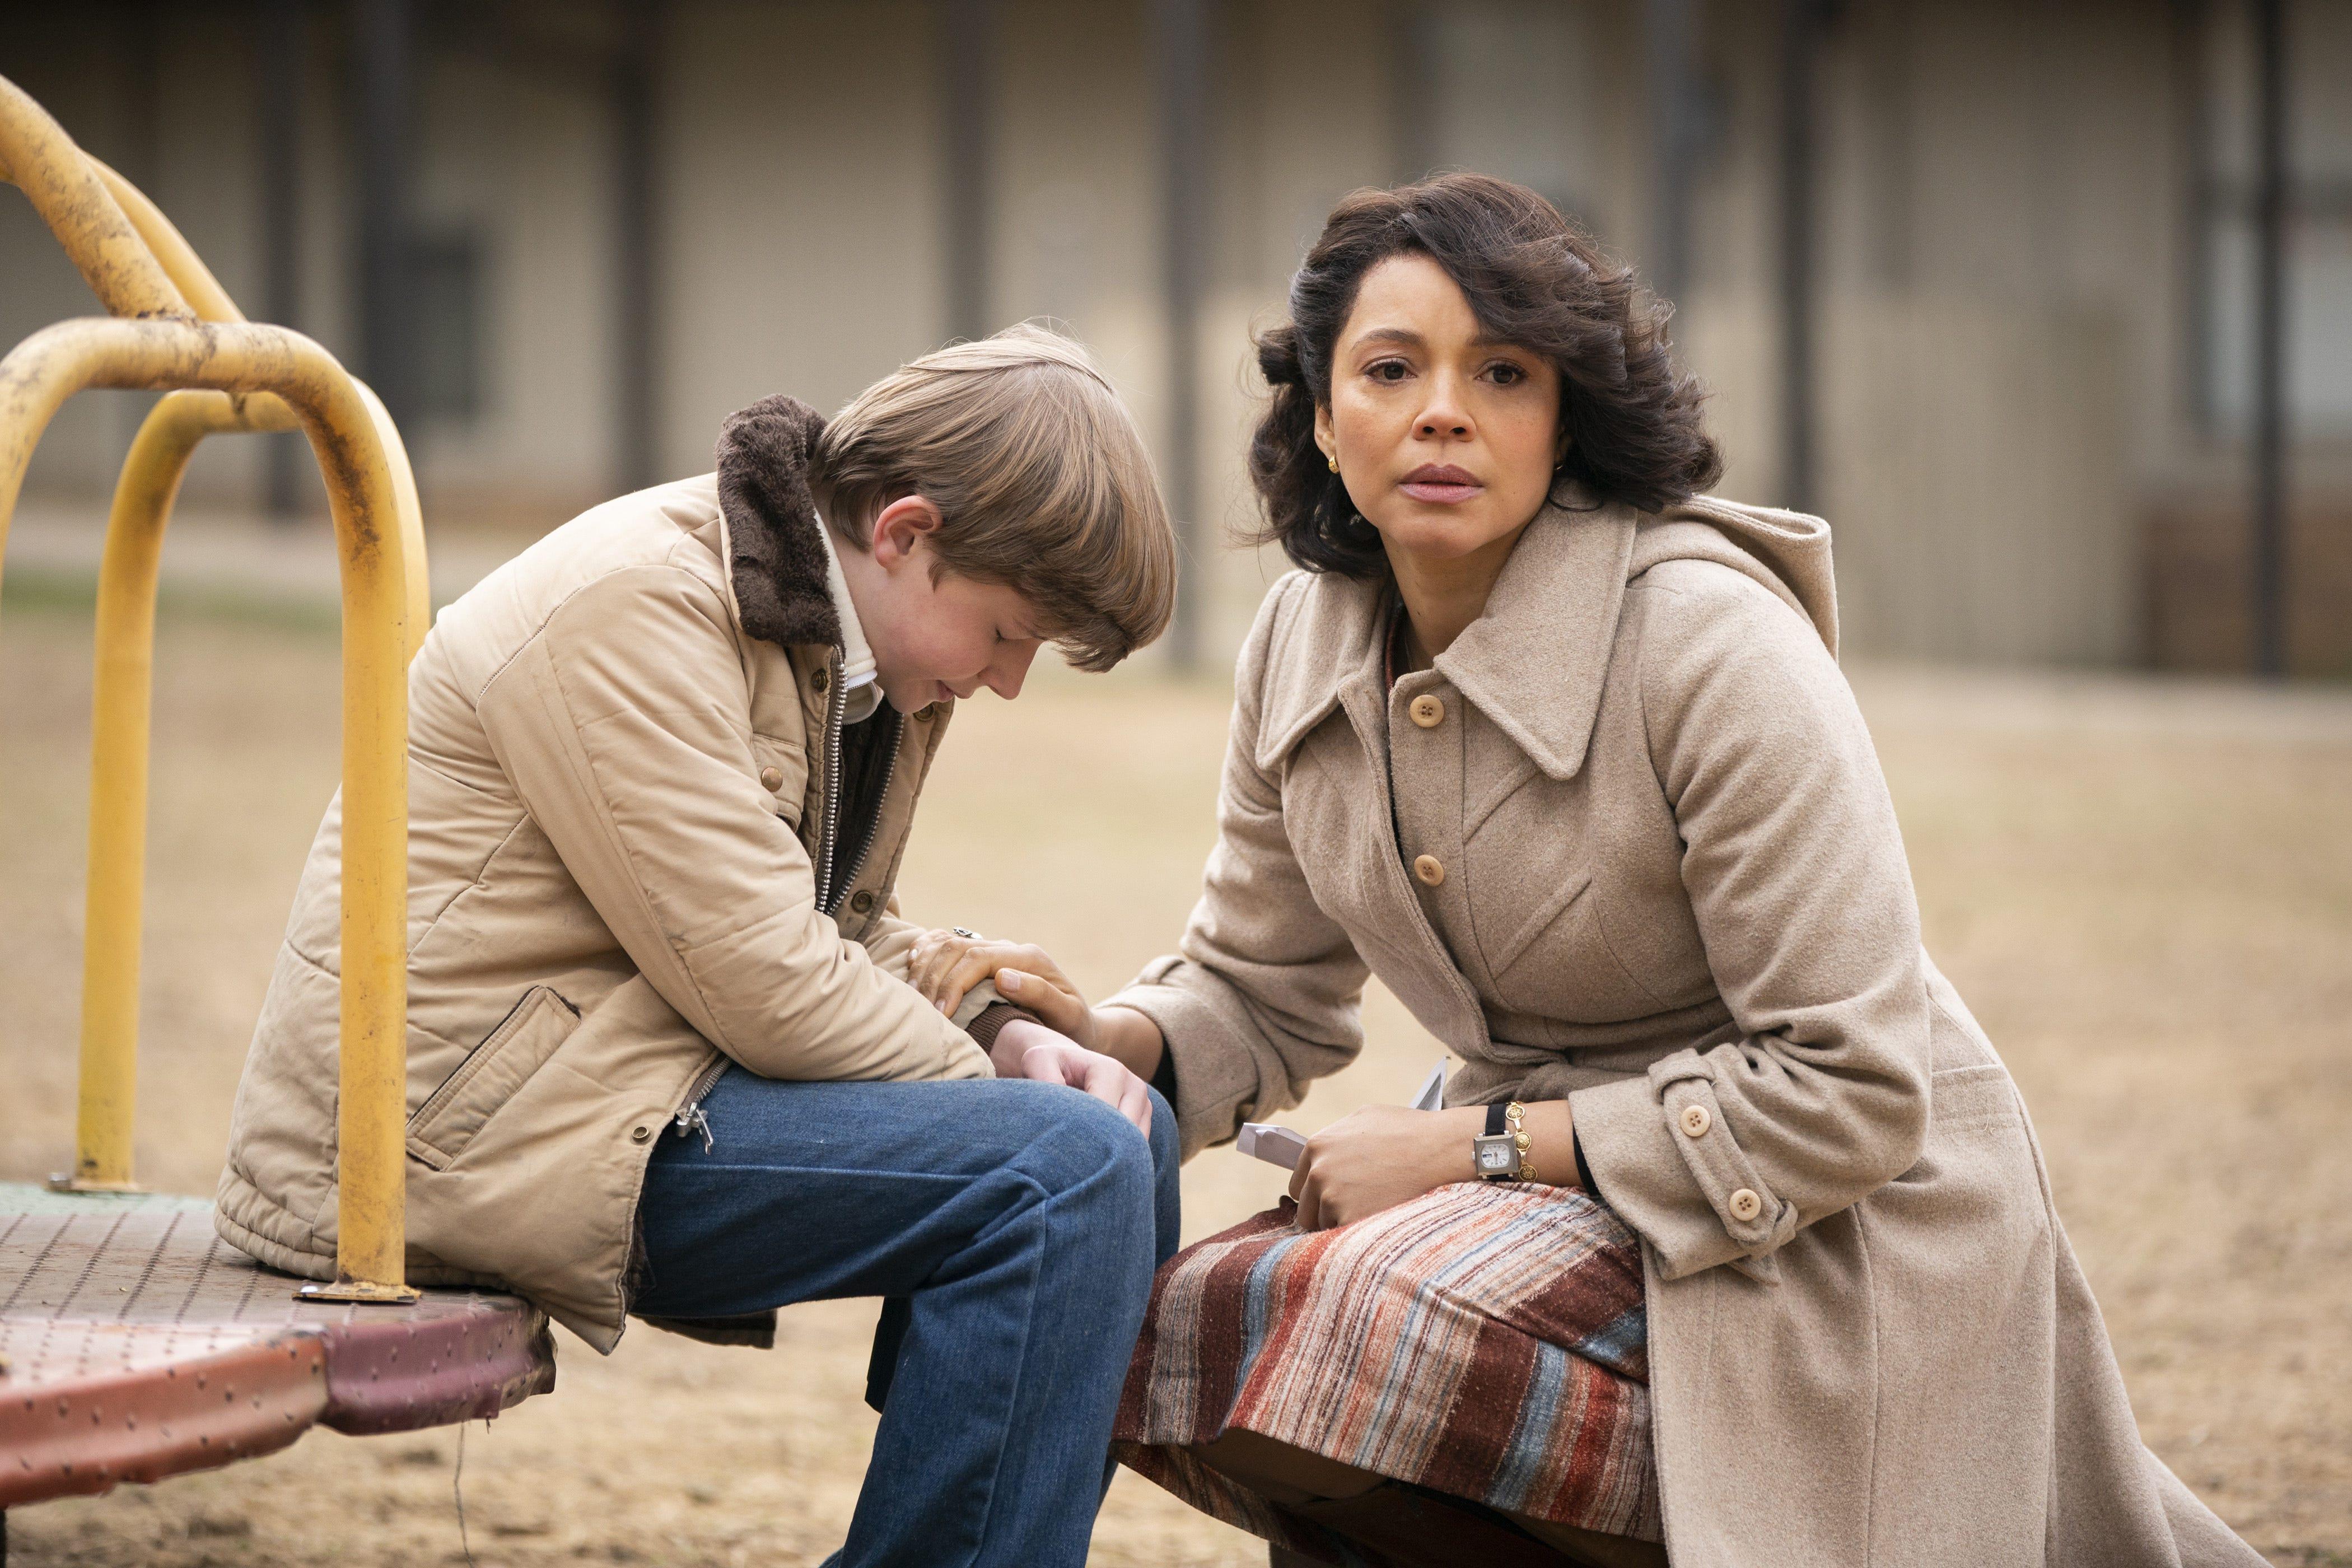 True Detective Season 3 Episode 3 Recap: The Big Never